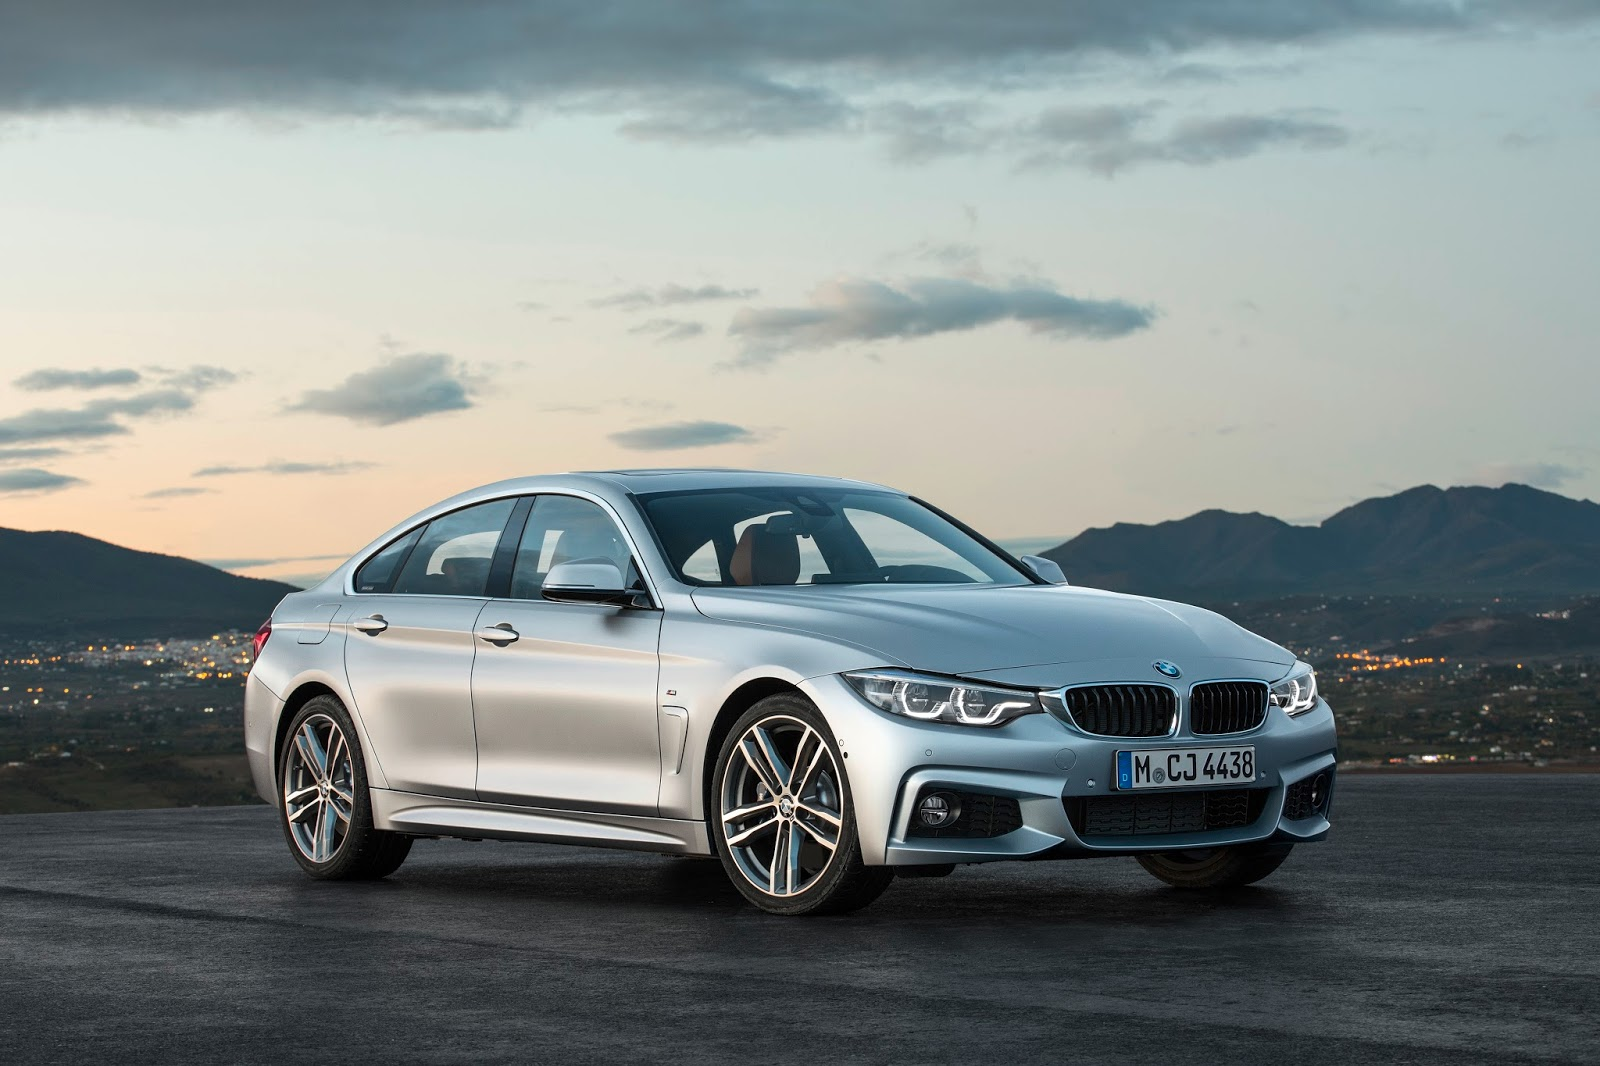 P90245284 highRes bmw 4 series m sport Η νέα BMW Σειρά 4, με πιο σφιχτή ρύθμιση ανάρτησης BMW, Bmw 4, BMW 4 Cabrio, BMW 4 Coupe, BMW 4 Gran Coupé, Facelift